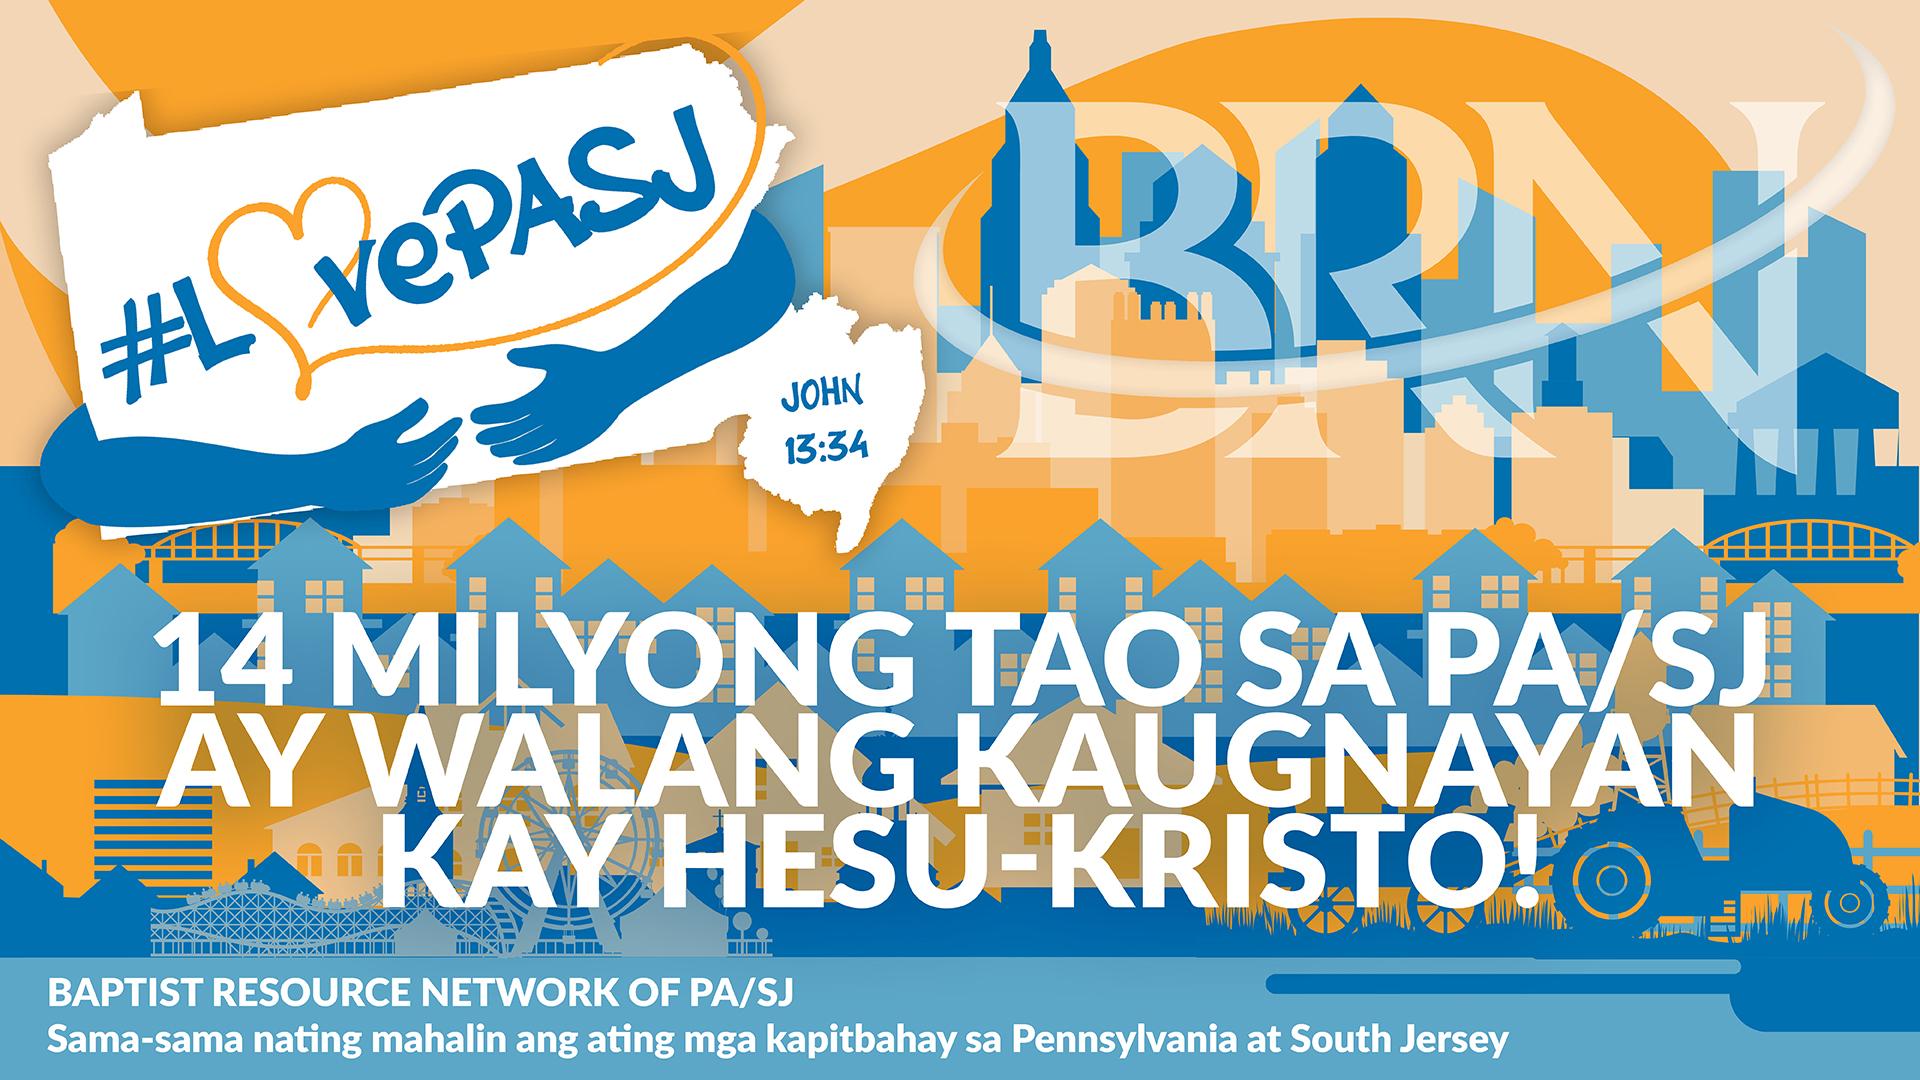 LovePASJ Slide 16x9 - Filipino